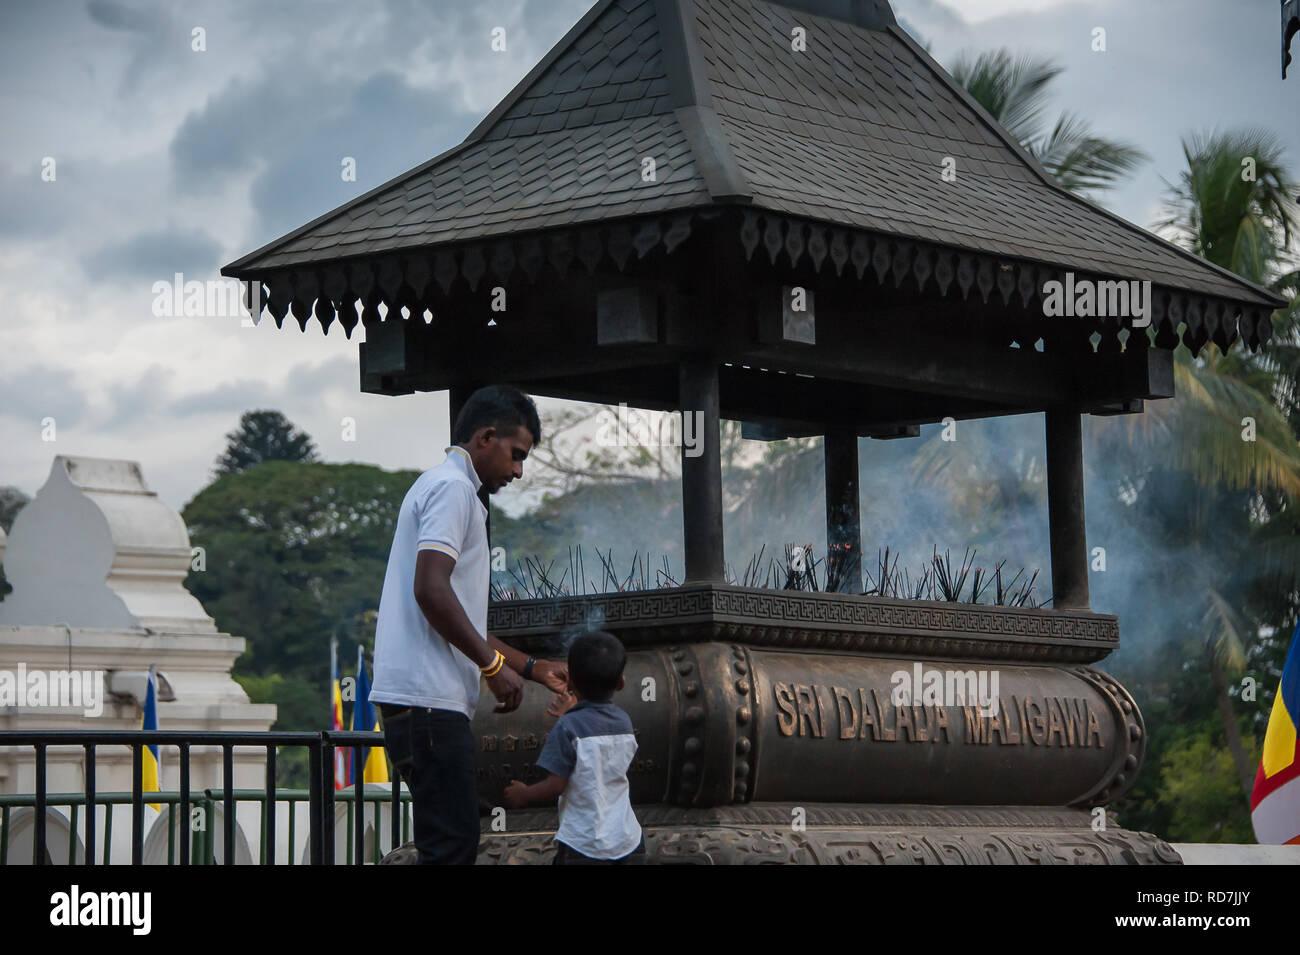 Kandy, Sri Lanka :  Temple of the Tooth (Sri Dalada Maligawa), an Indian man and child light incense to offer up prayers to Buddha - Stock Image